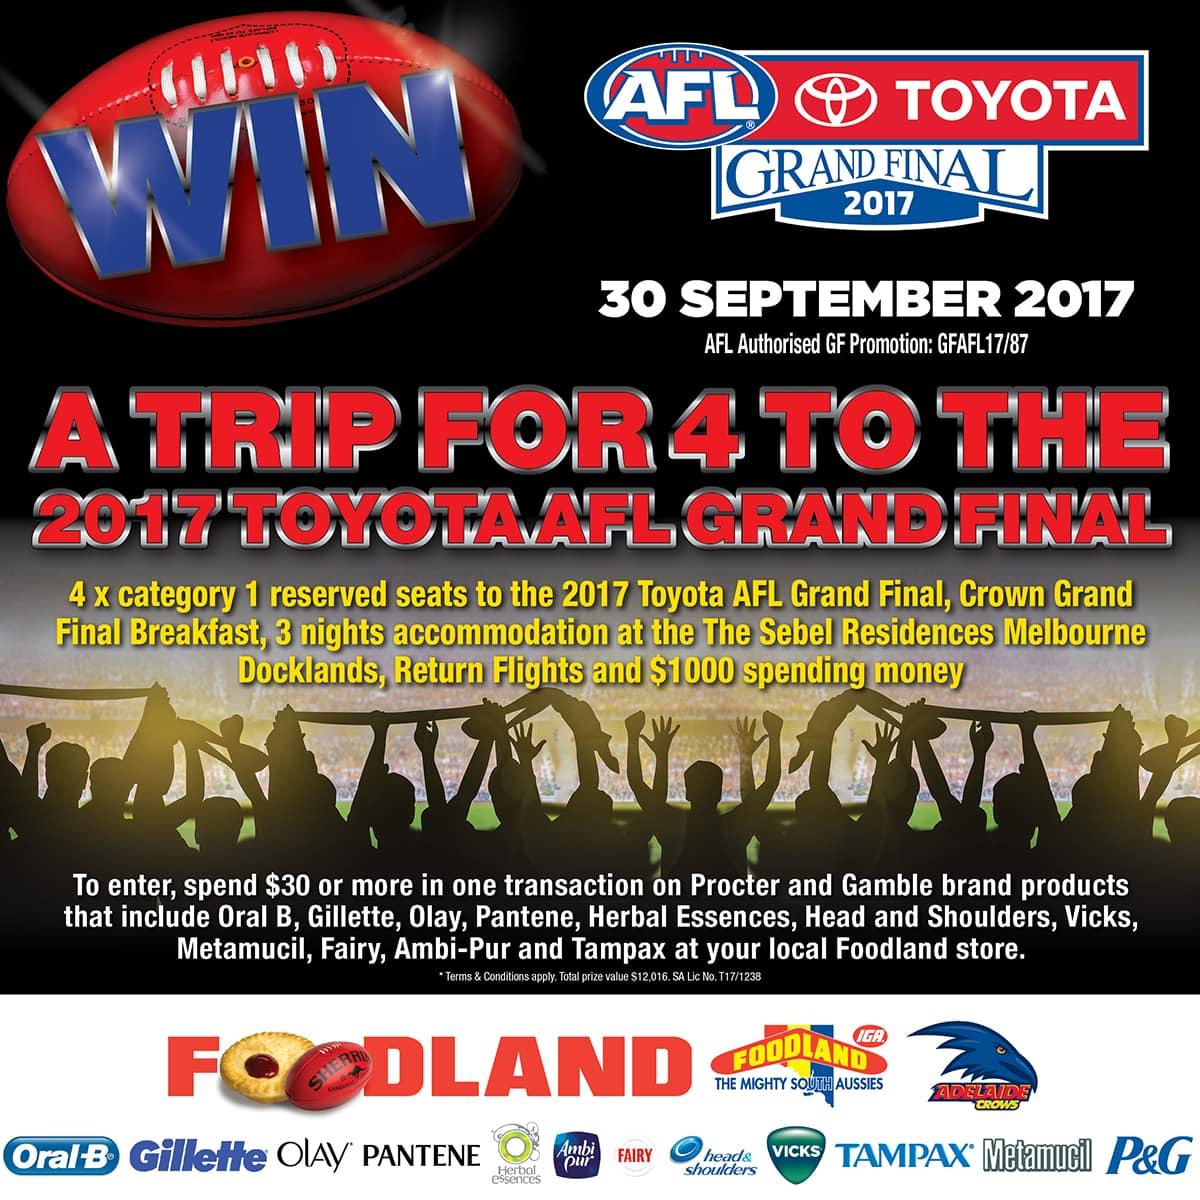 PG_AFL GF2017_1200x1200 v5